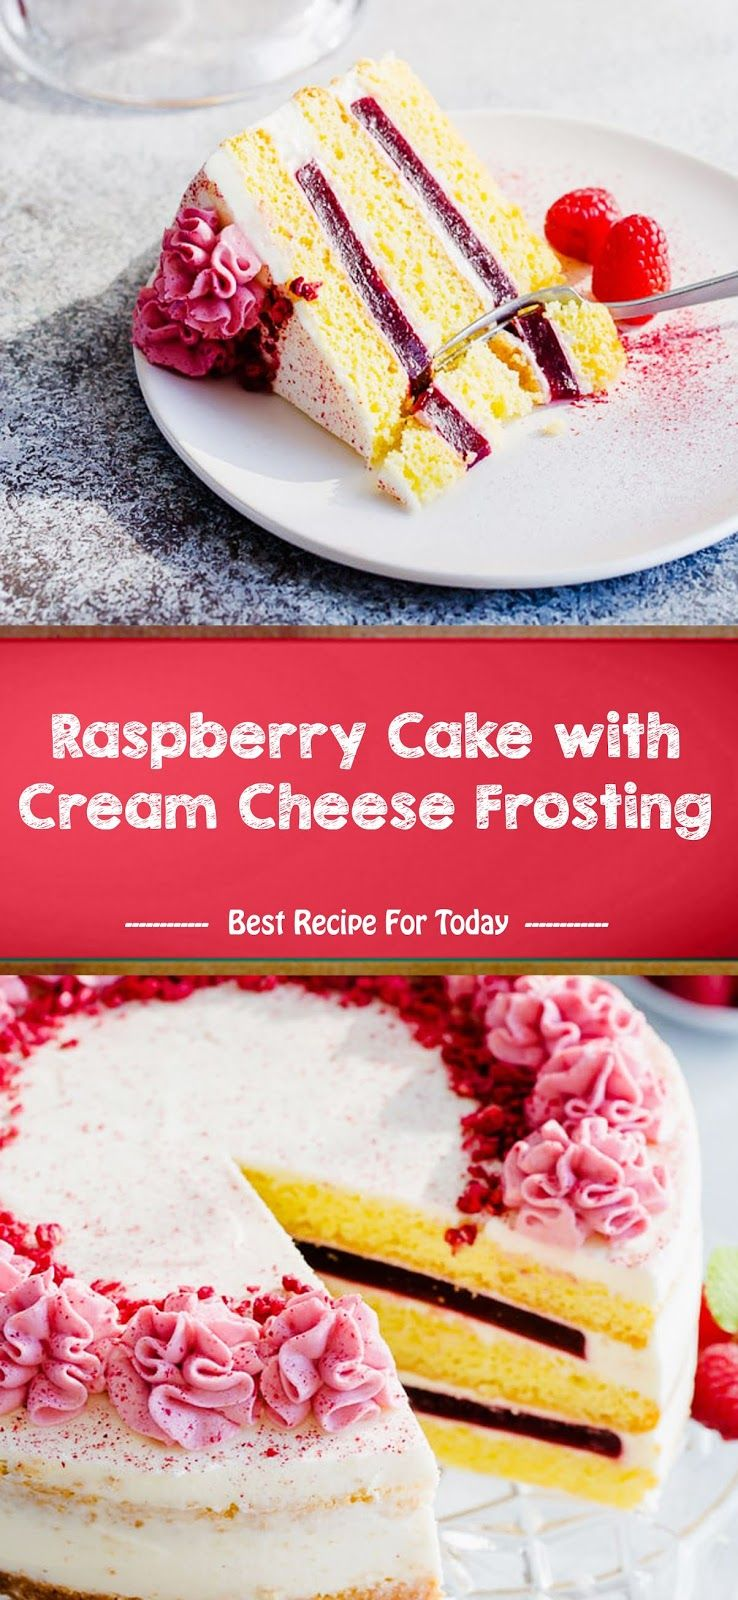 Raspberry Cake With Cream Cheese Frosting Healthy Recipes Resep Makanan Penutup Resep Kue Keju Hidangan Penutup